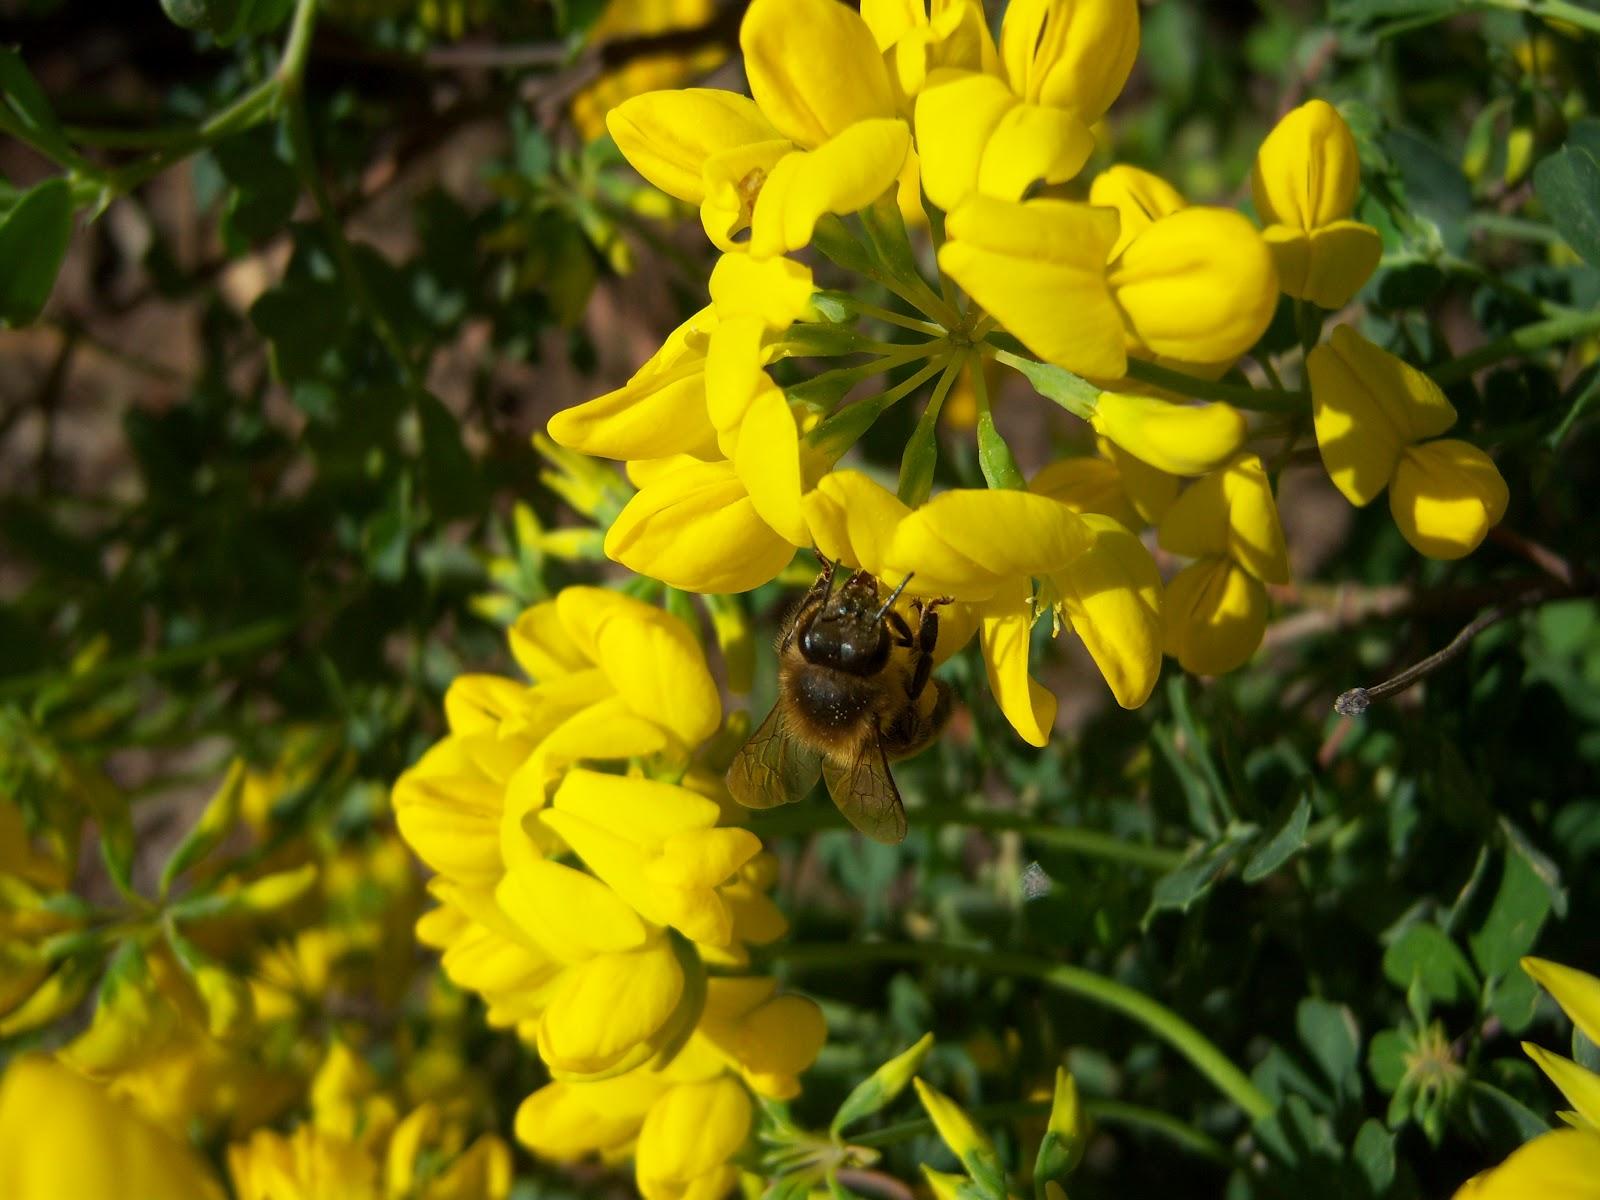 Abejas mel feras bot nic serrat for Ahuyentar abejas jardin